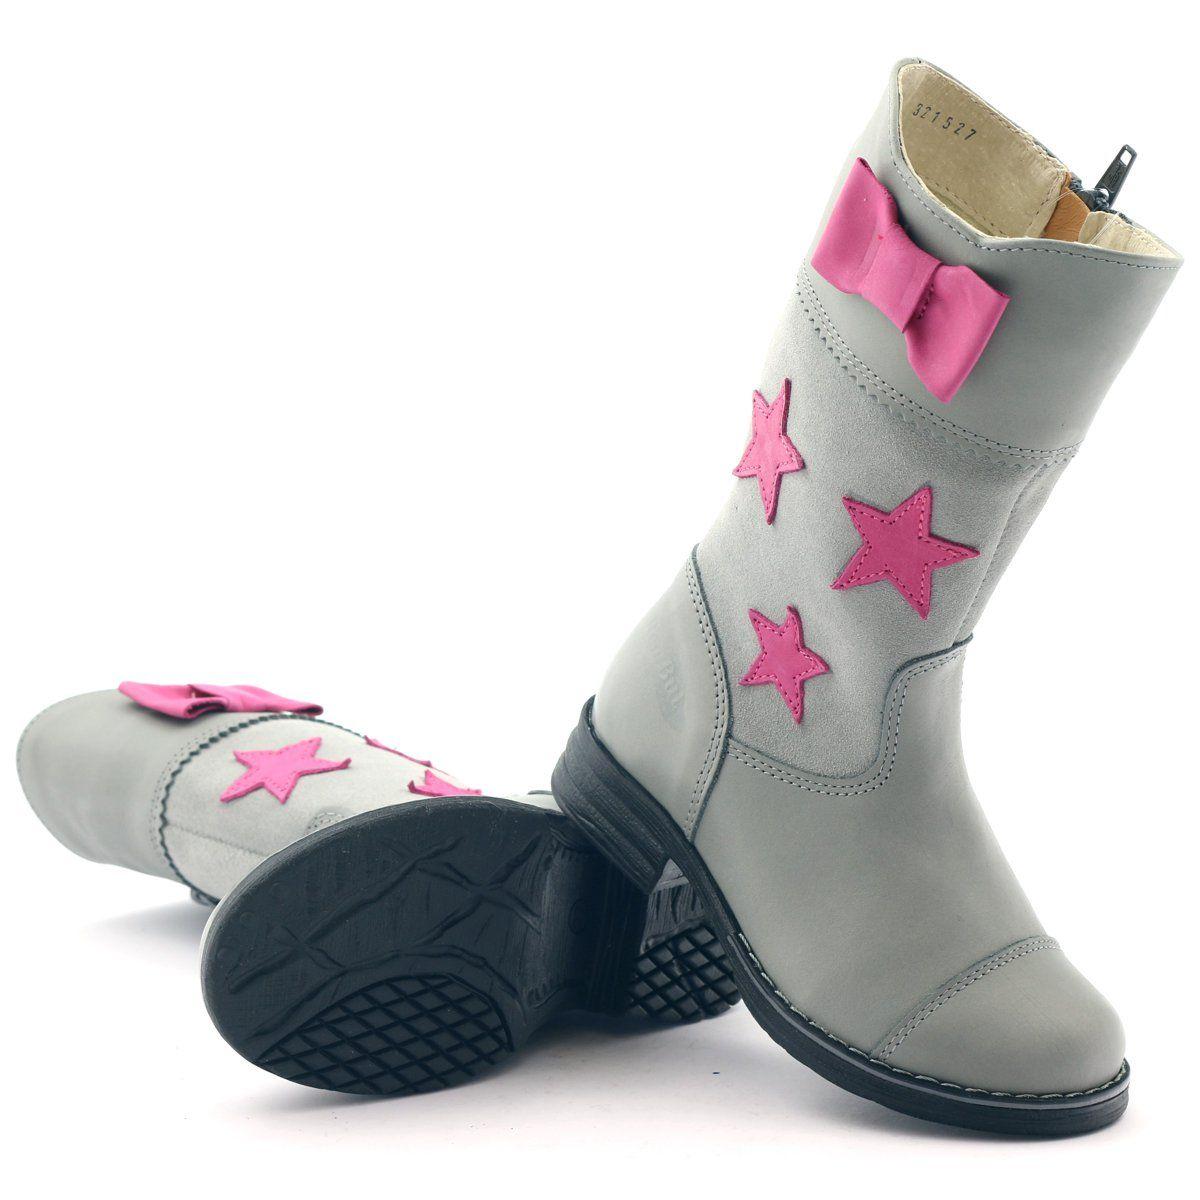 Kozaczki Dziewczece Ren But 3215 Szare Rozowe Boots Childrens Boots Girls Boots